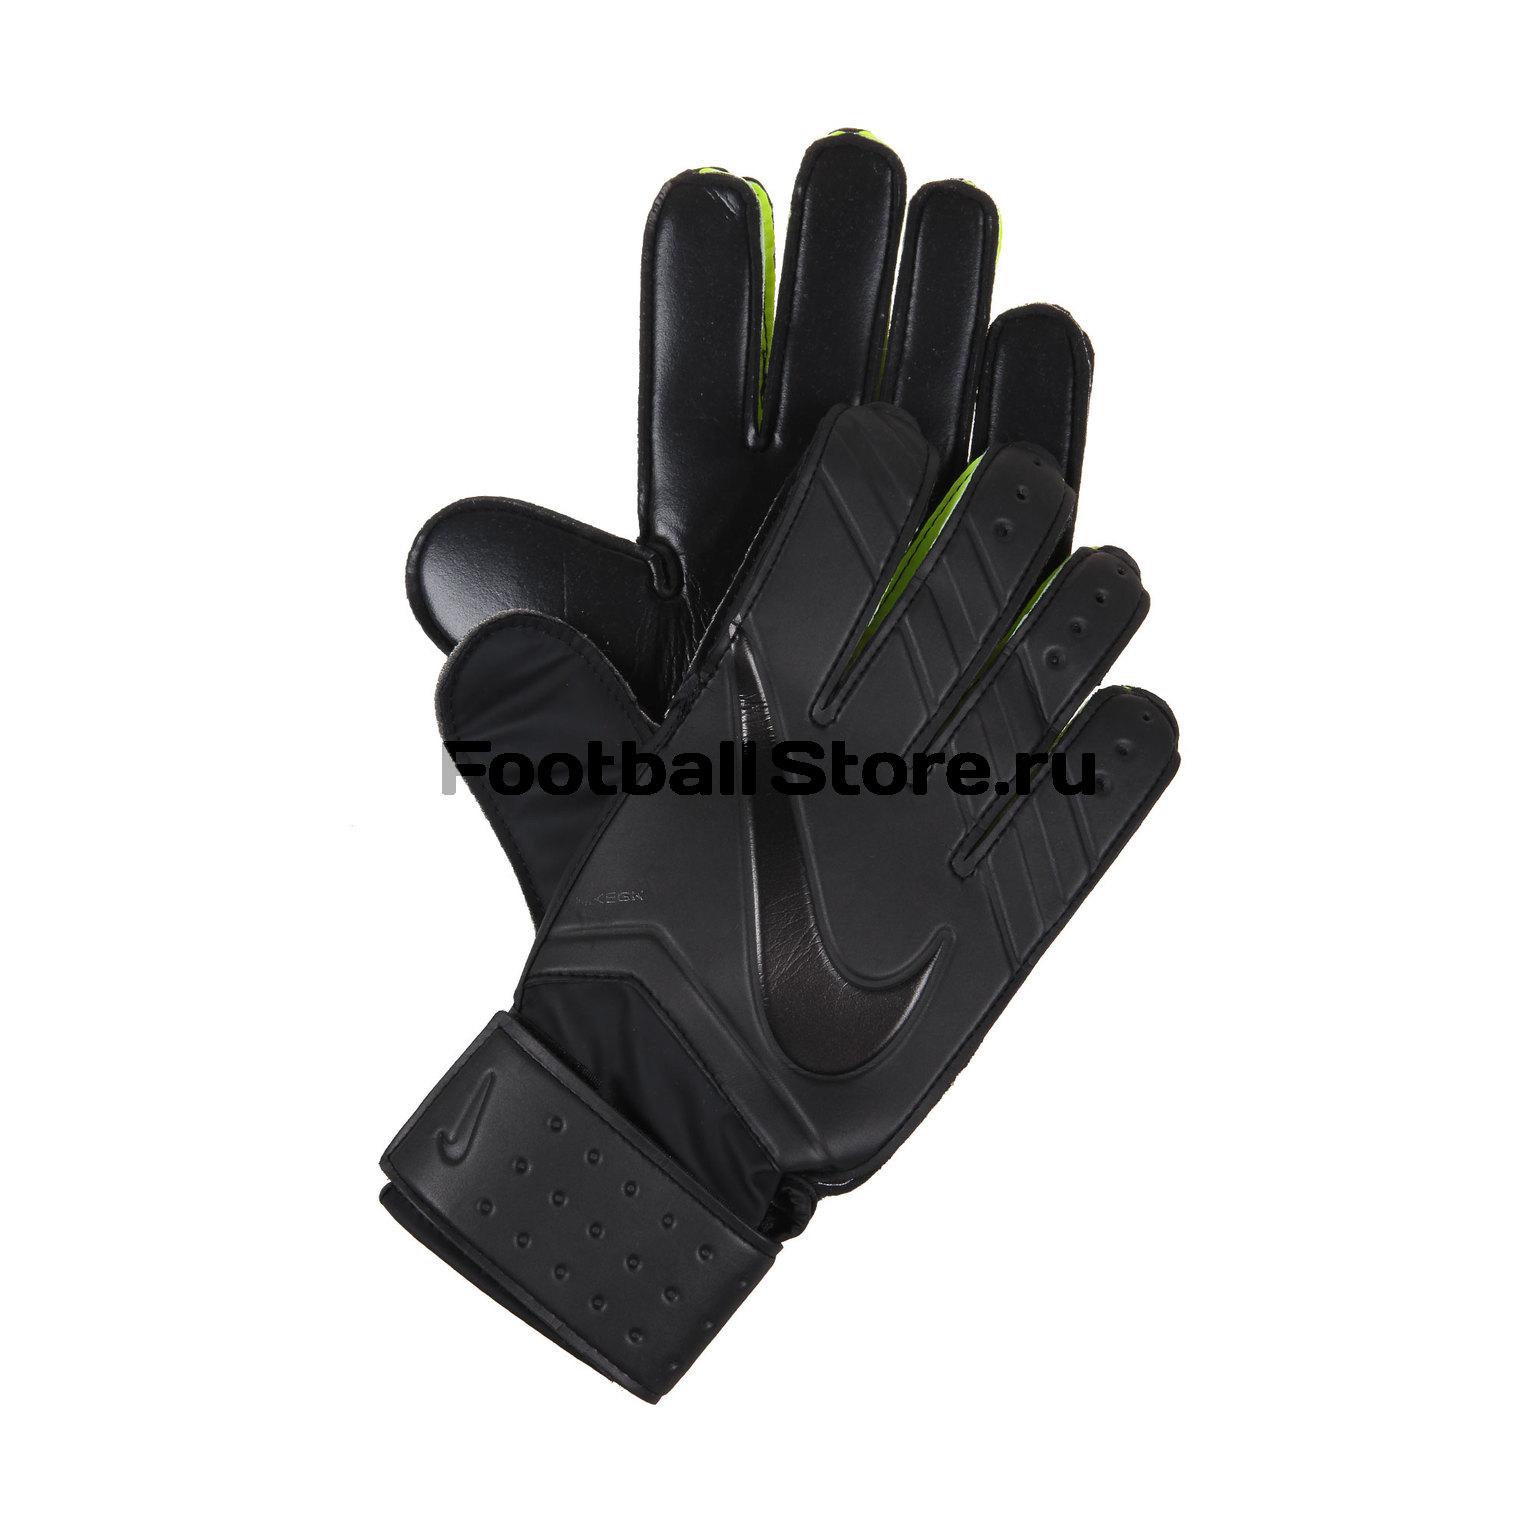 Перчатки Nike Перчатки вратарские Nike GK Match FA16 GS0330-011